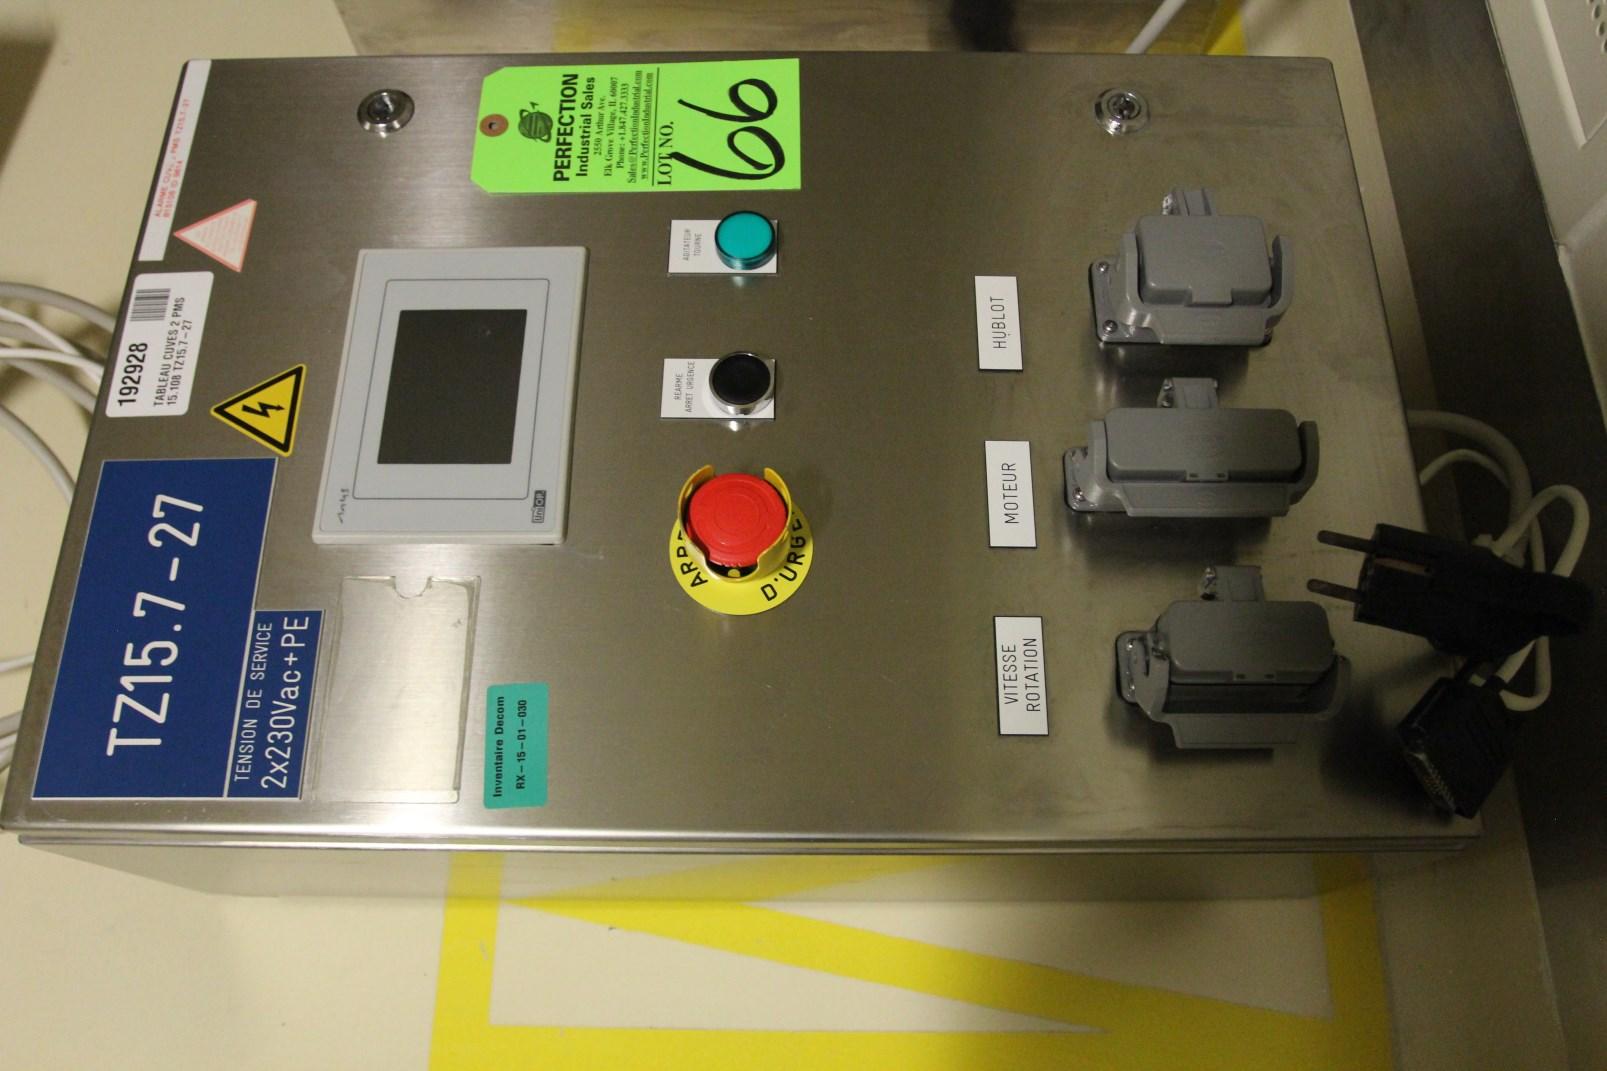 Lot 66 - Siabt UniOp PLC Control for Vessel